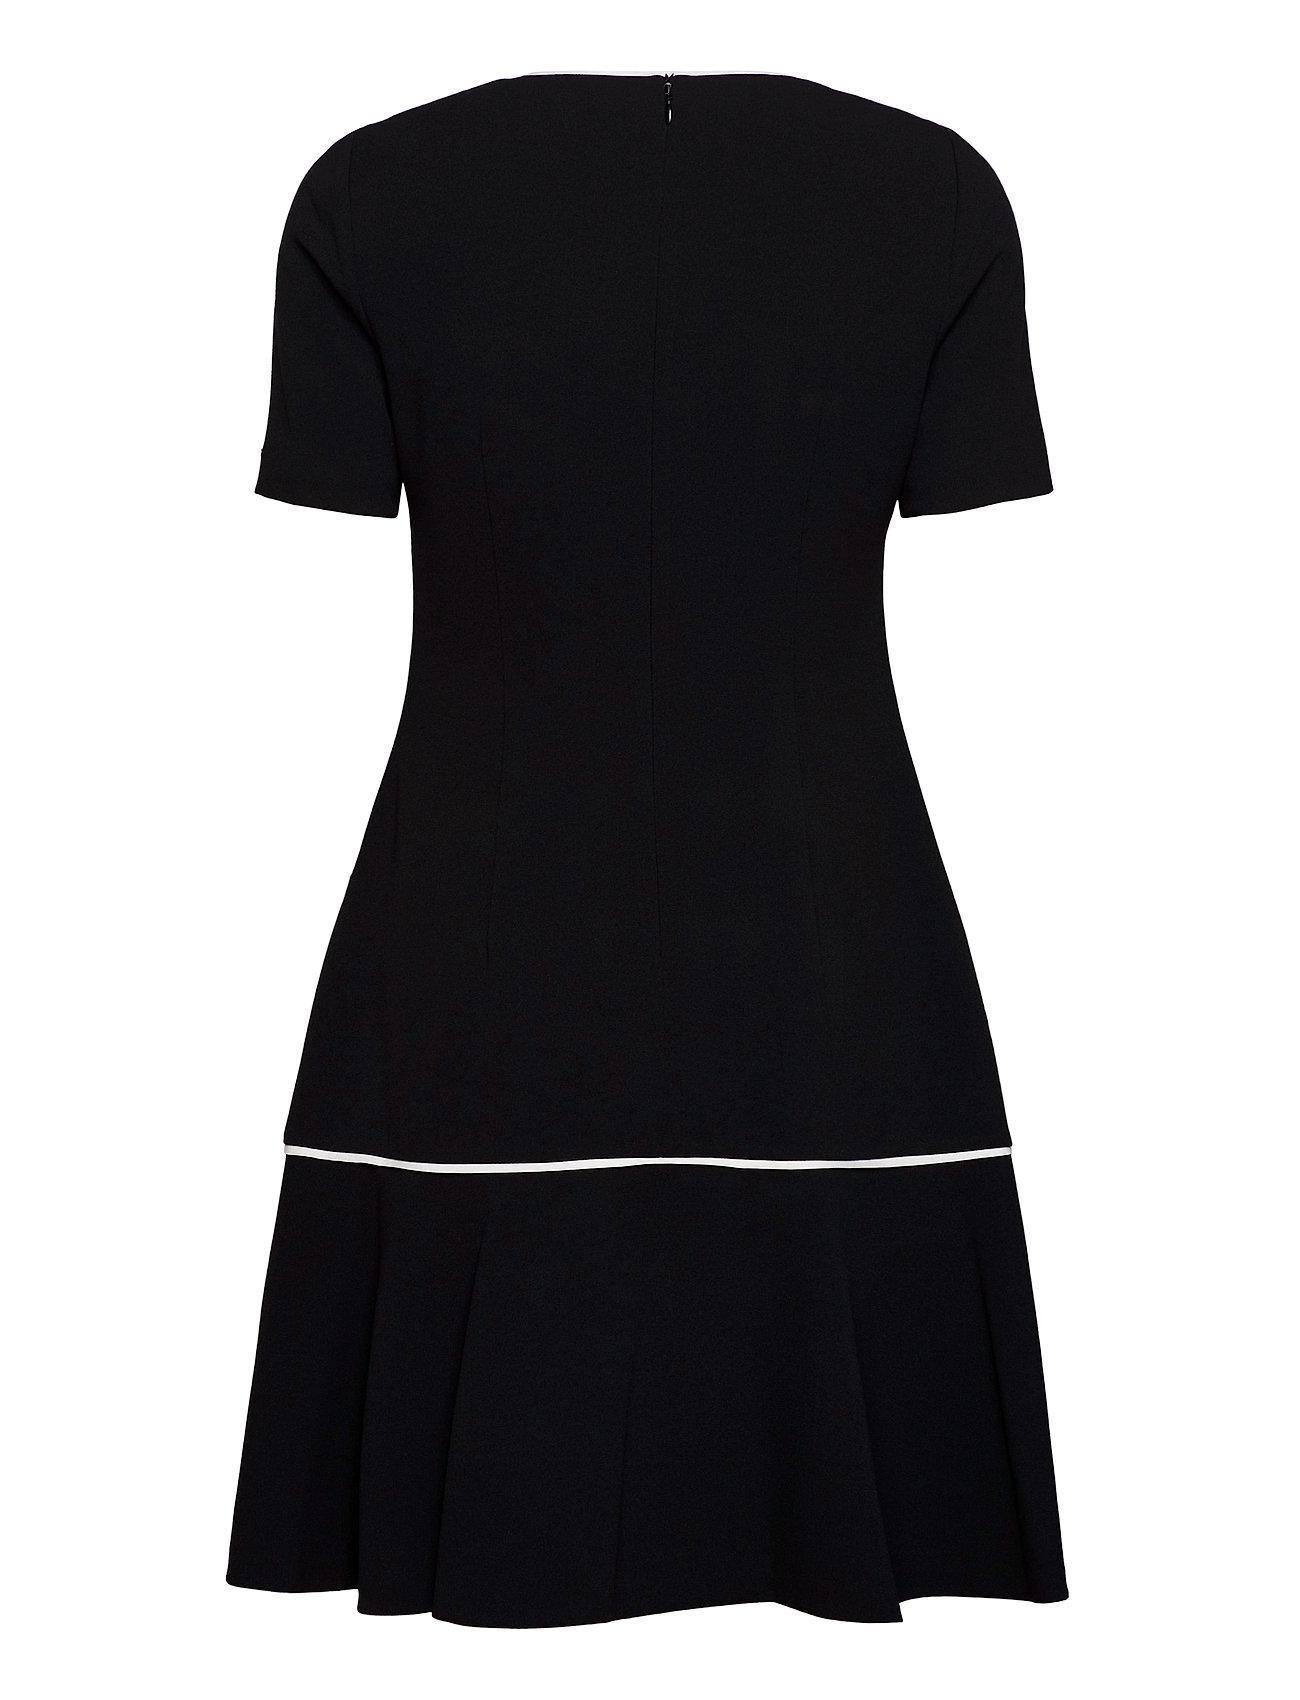 CALVIN KLEIN Kleider | Ss Piping Detail Peplum Dress Kleid Knielang Schwarz CALVIN KLEIN